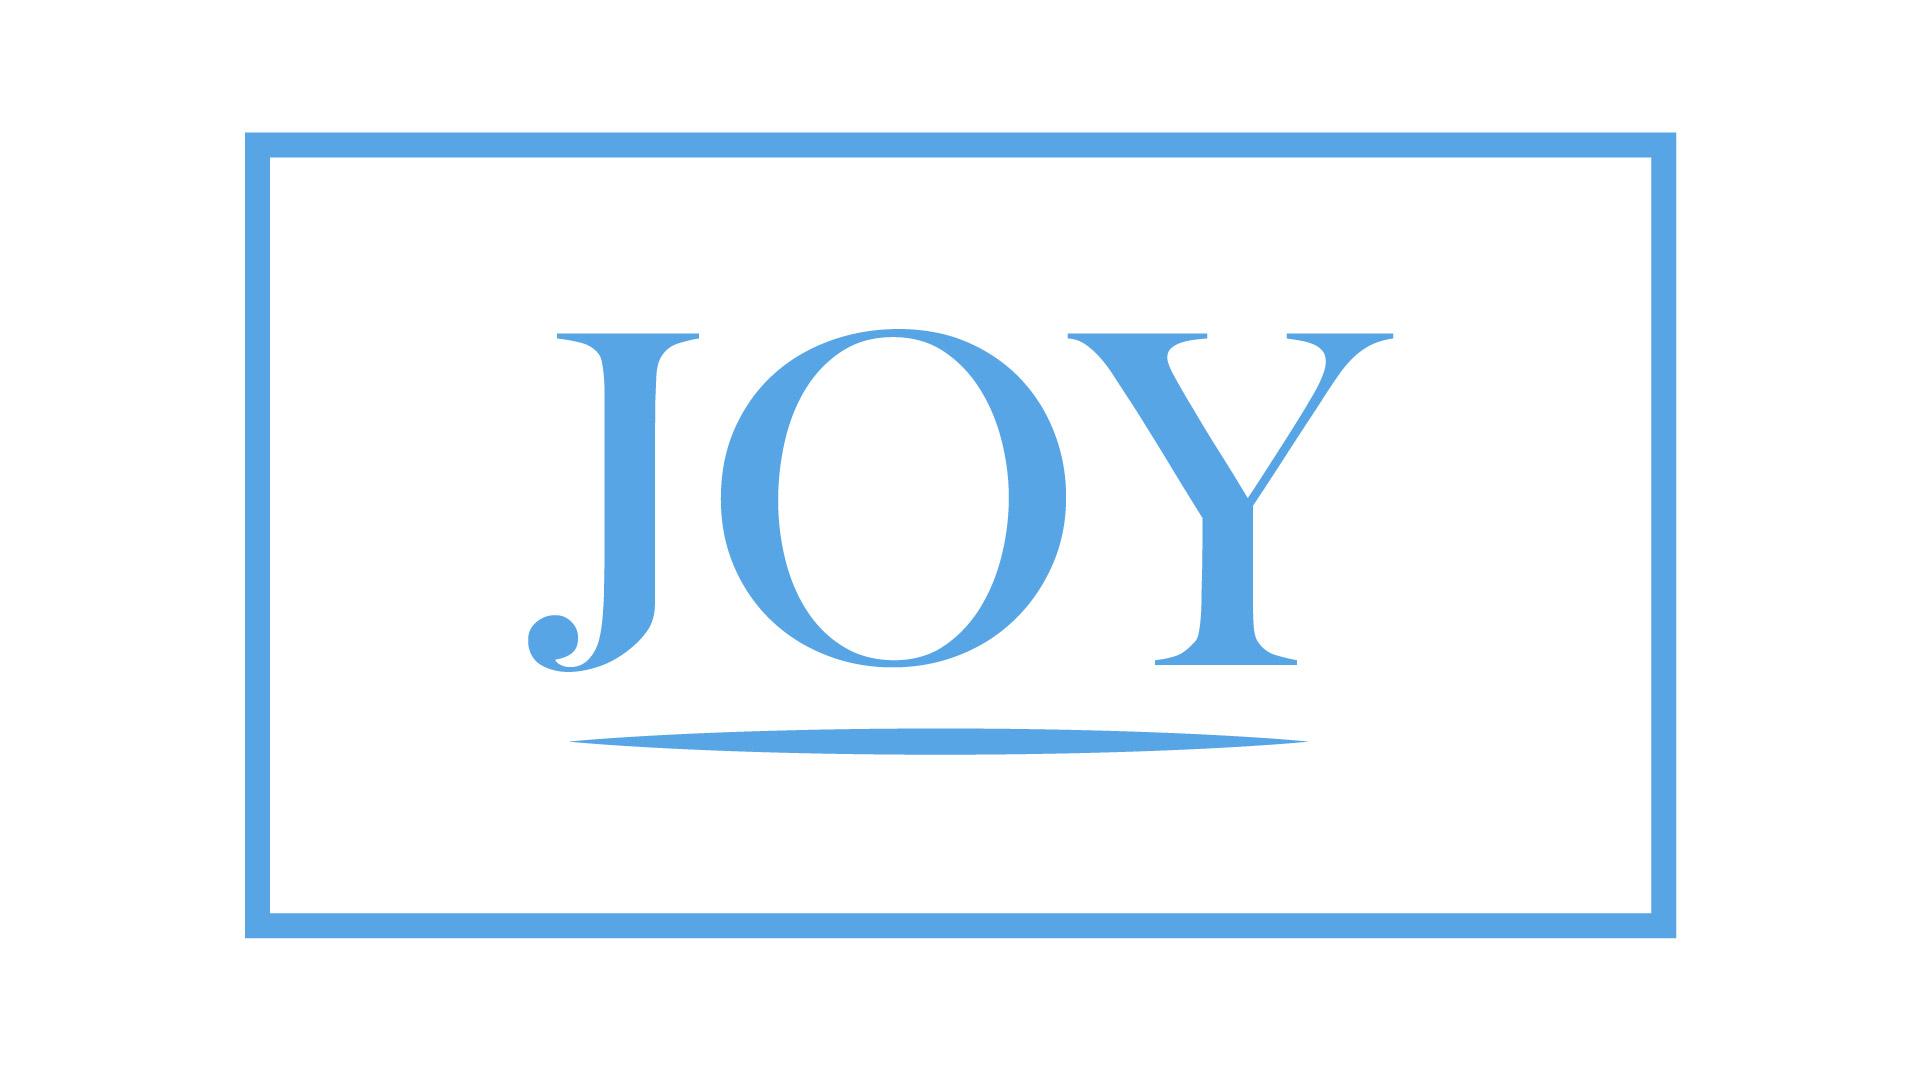 Joy-01.jpg